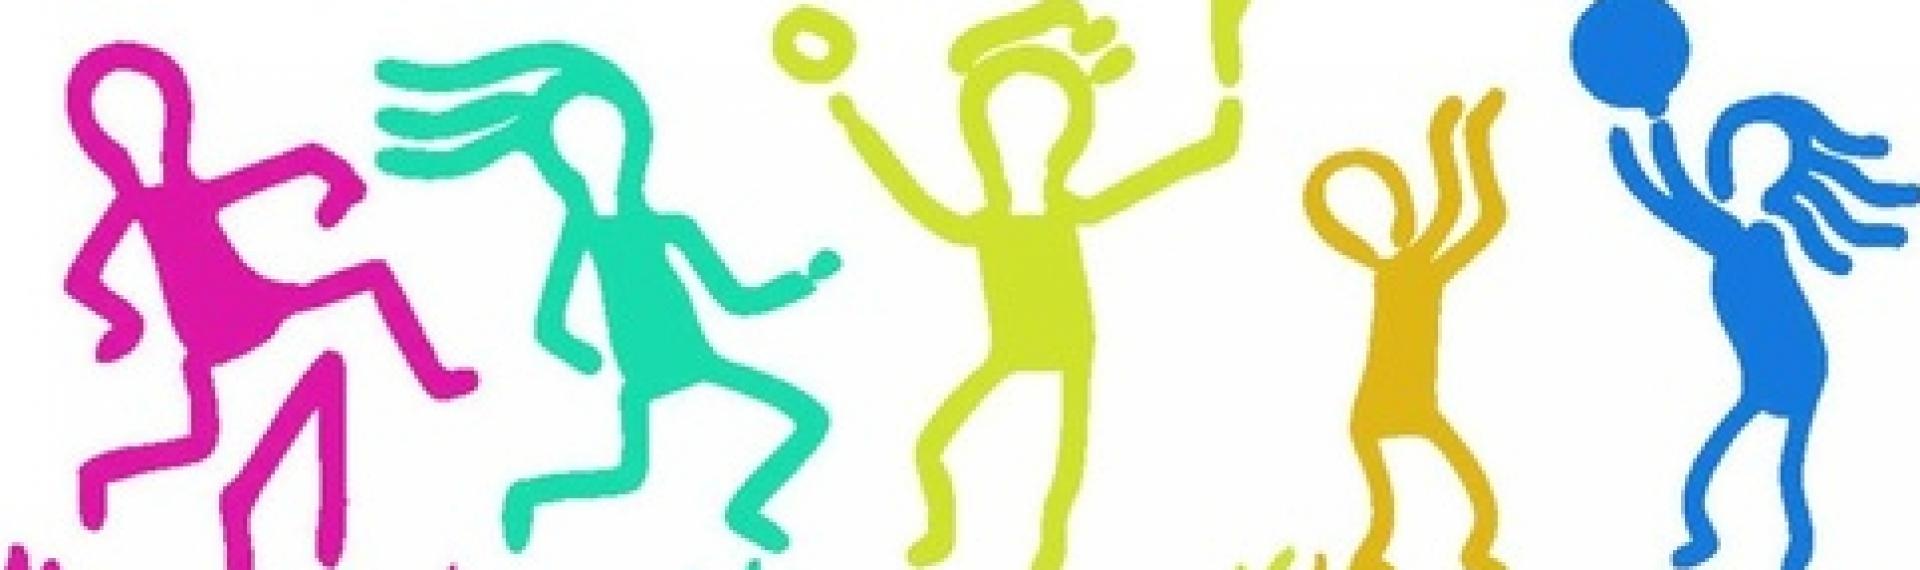 Voorkeur Sportdag 2018. - Schoolblog | Basisschool de Maasparel &ZO94